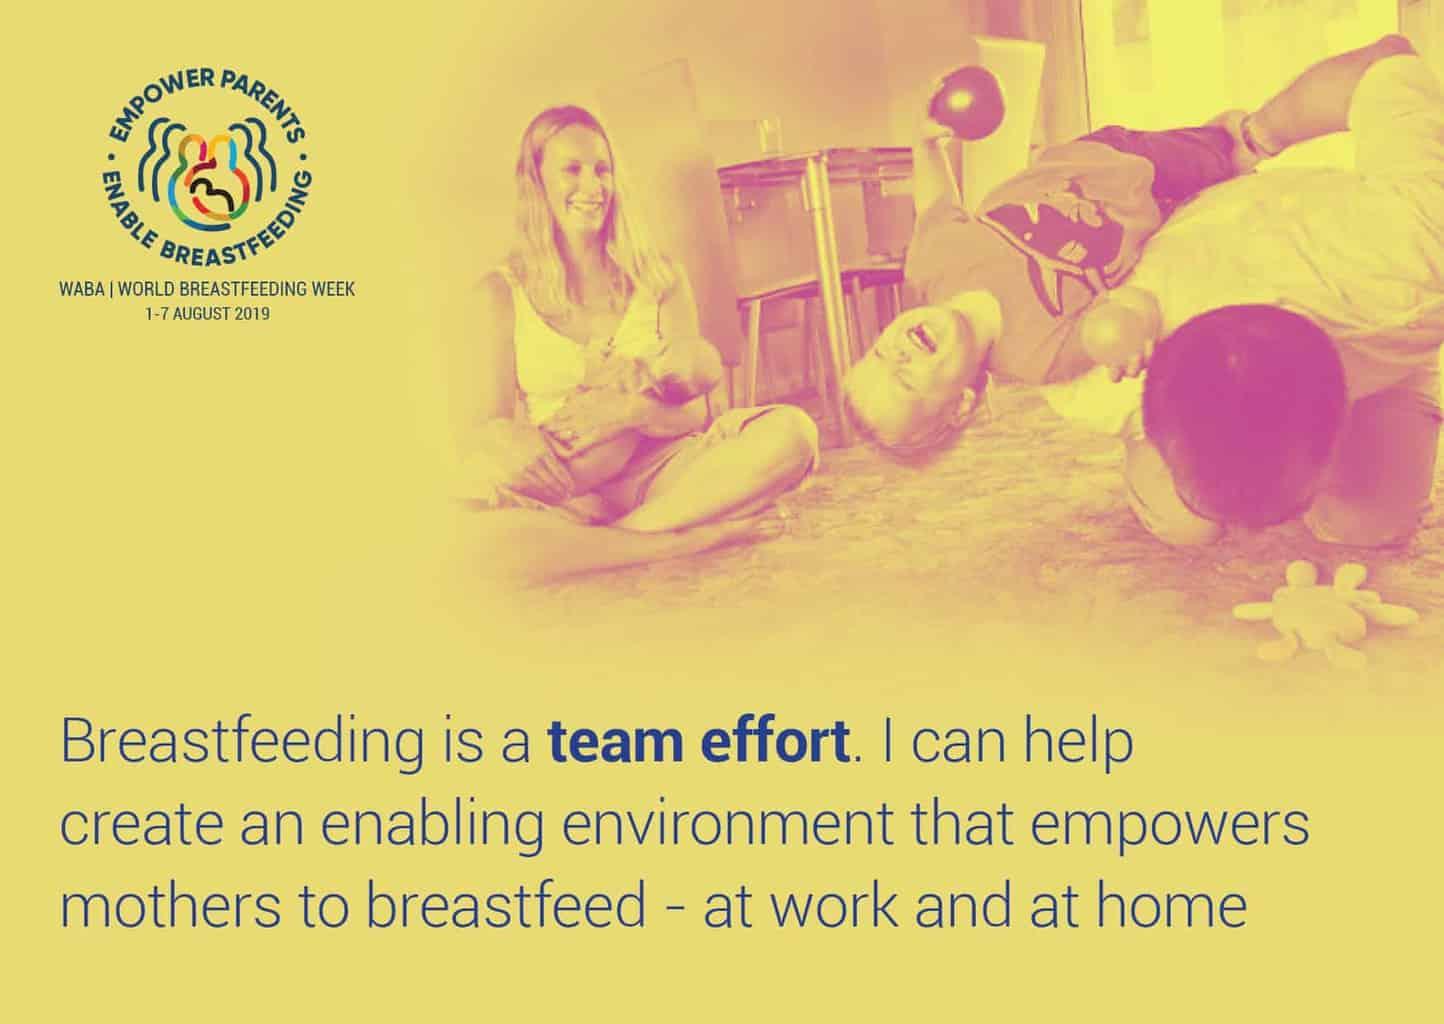 WABA World Breastfeeding Week 2019 - EMPOWER PARENTS, ENABLE BREASTFEEDING